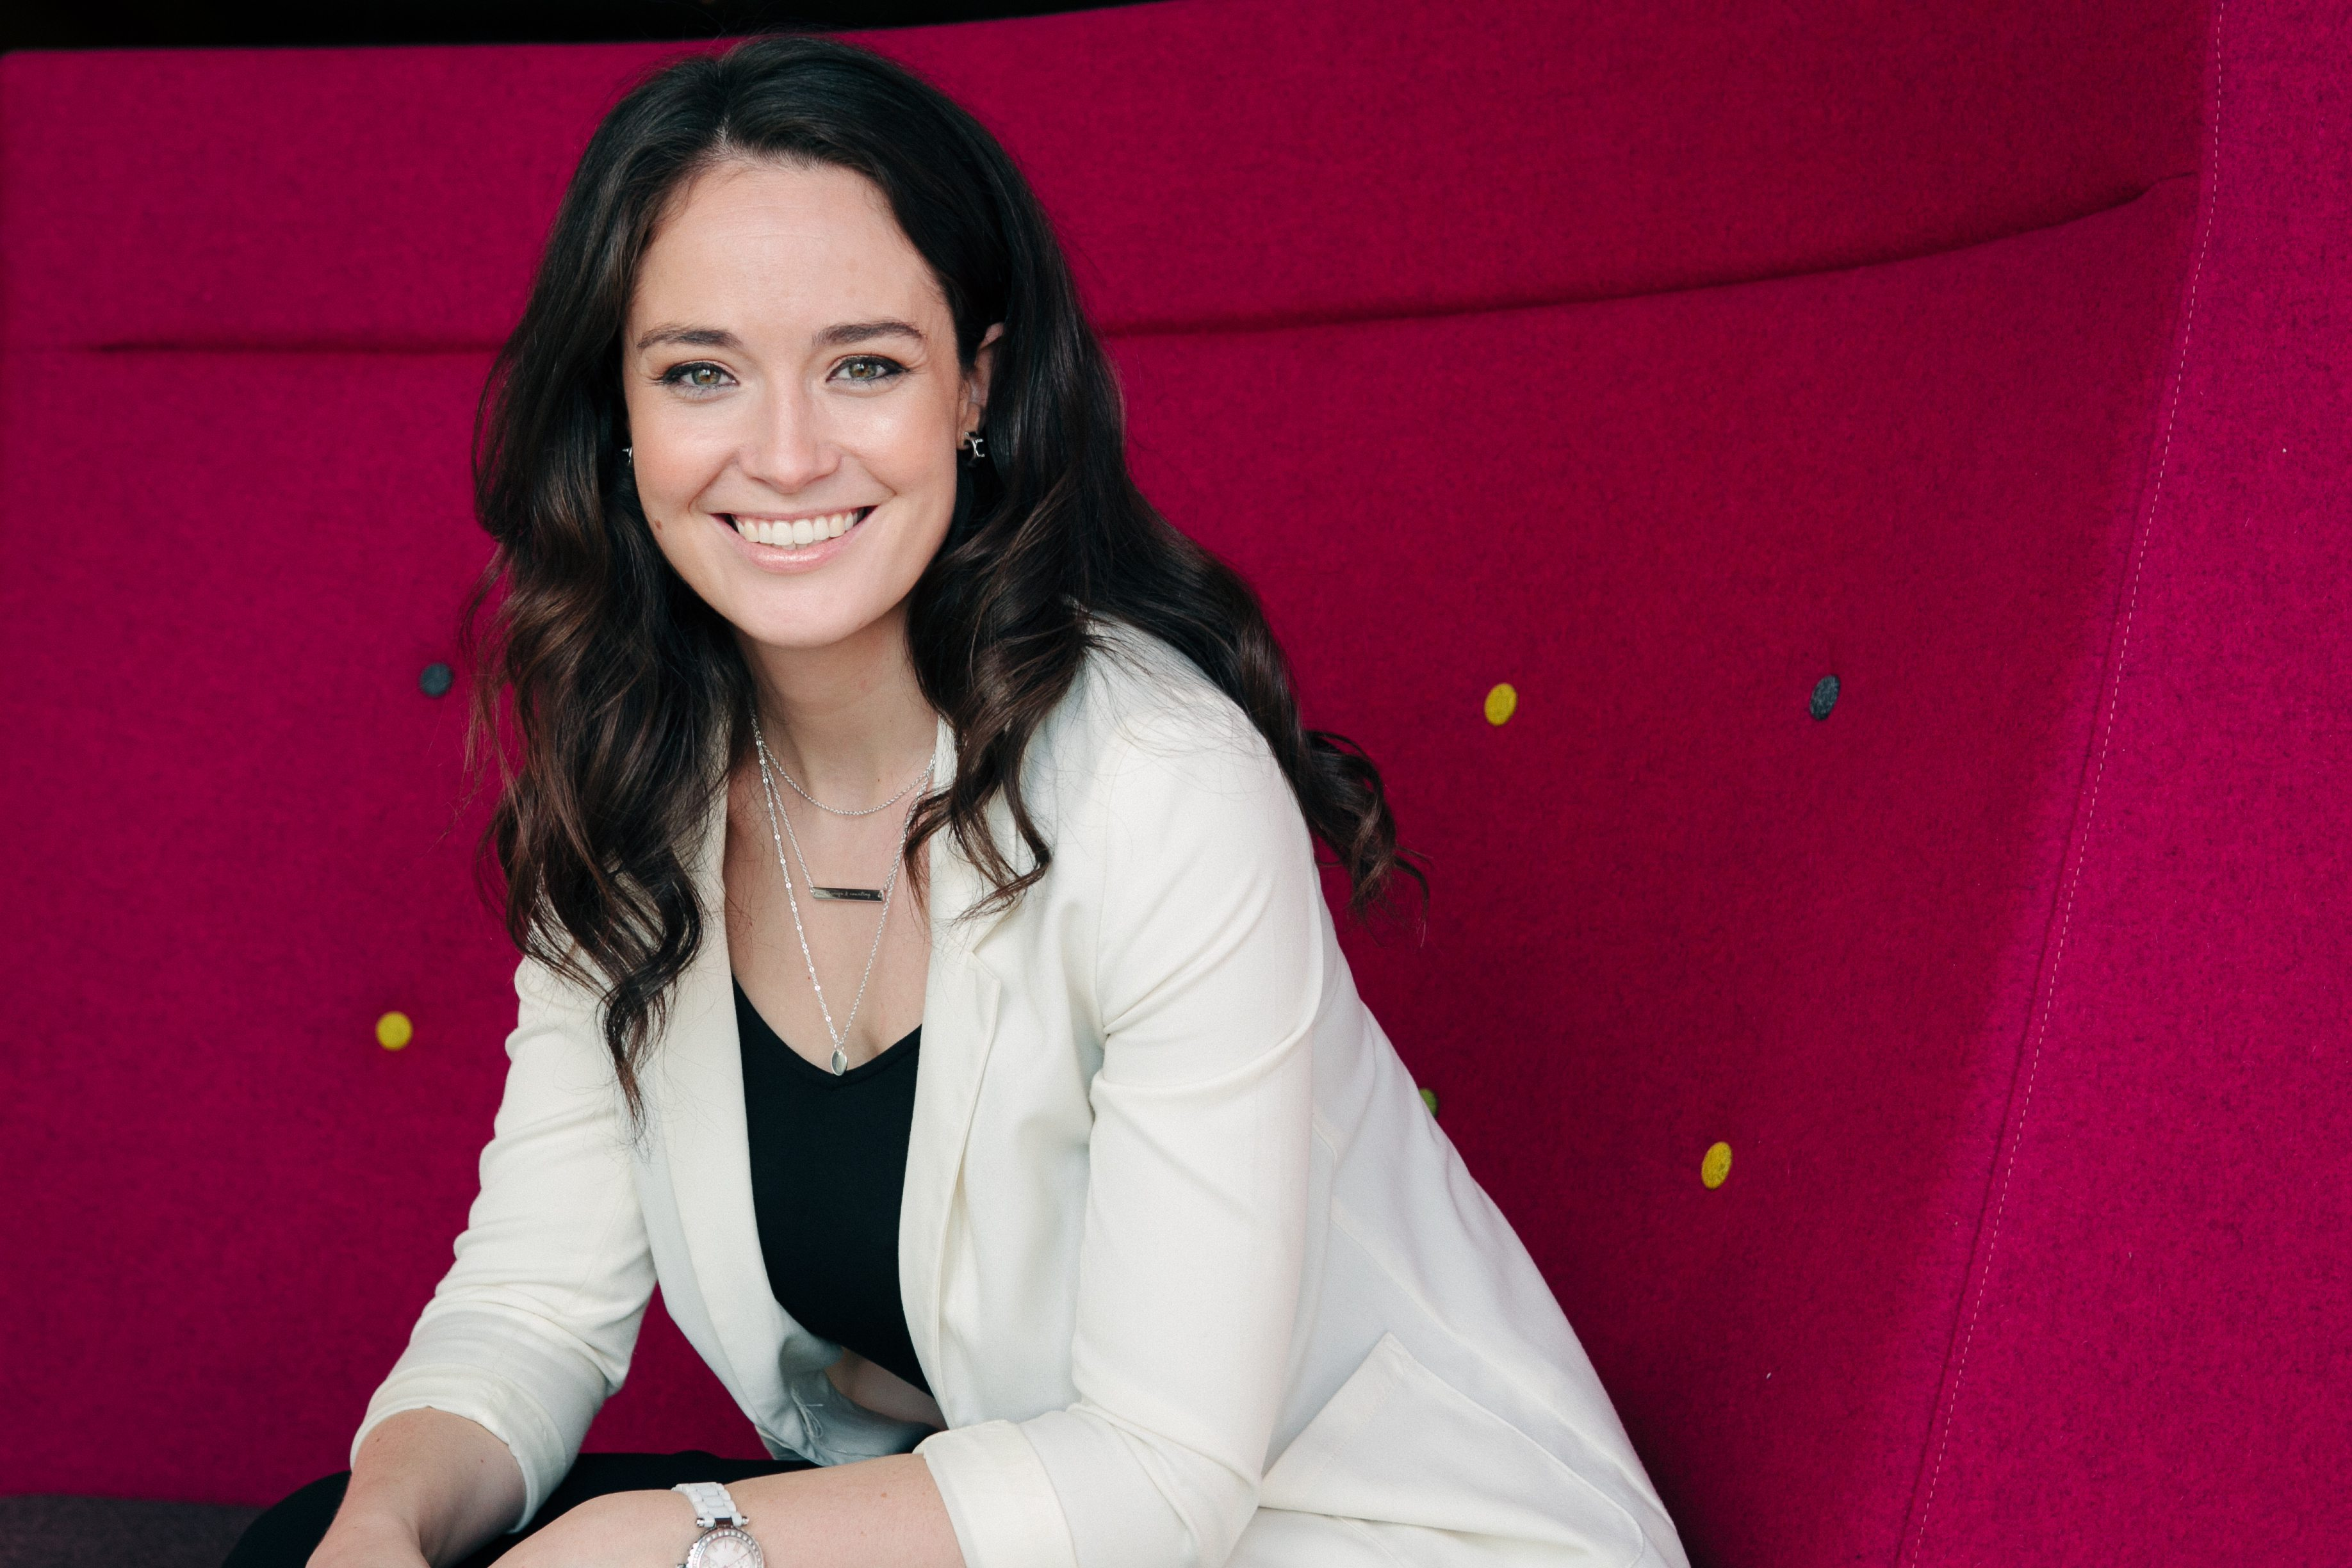 Getaways presenter Jennifer Reoch